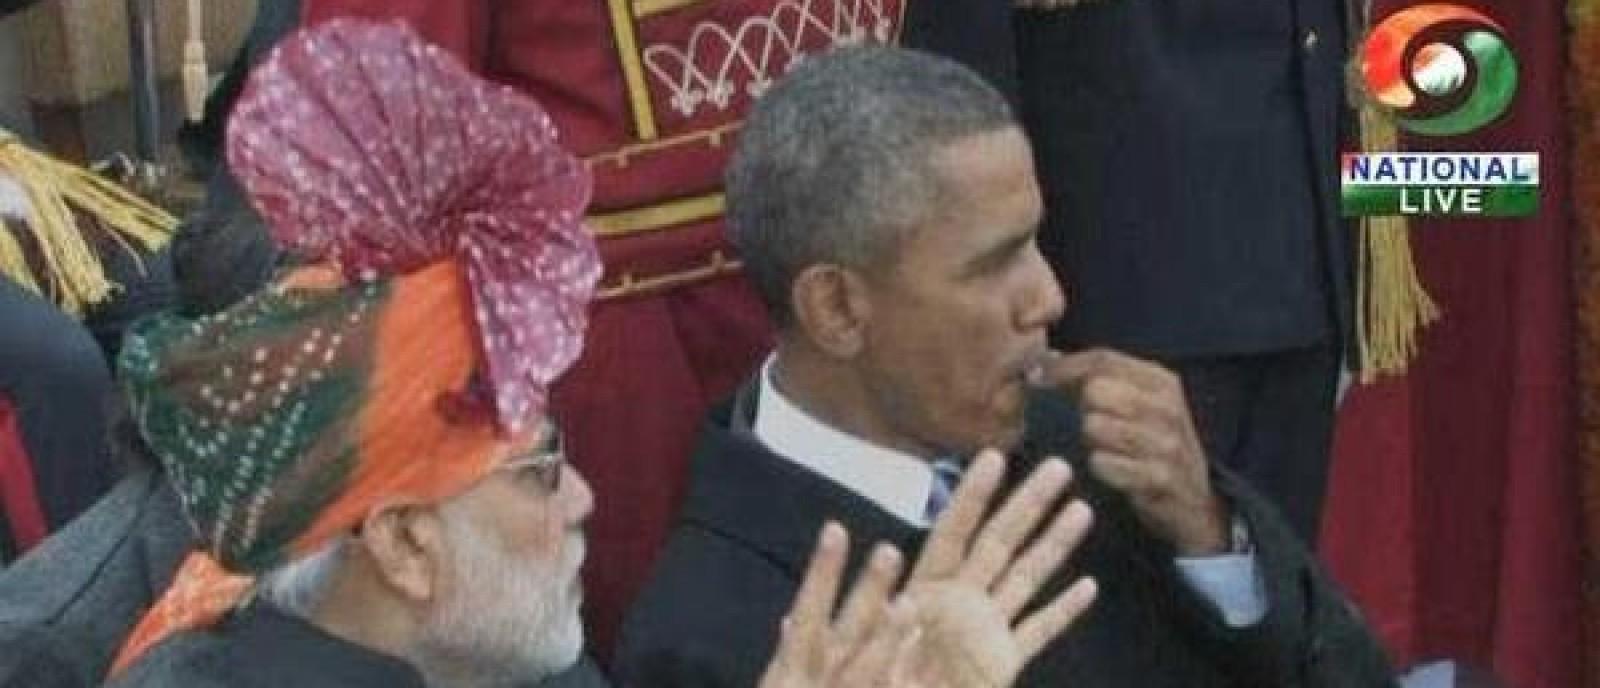 obama-and-modi-chewing_gum.jpg